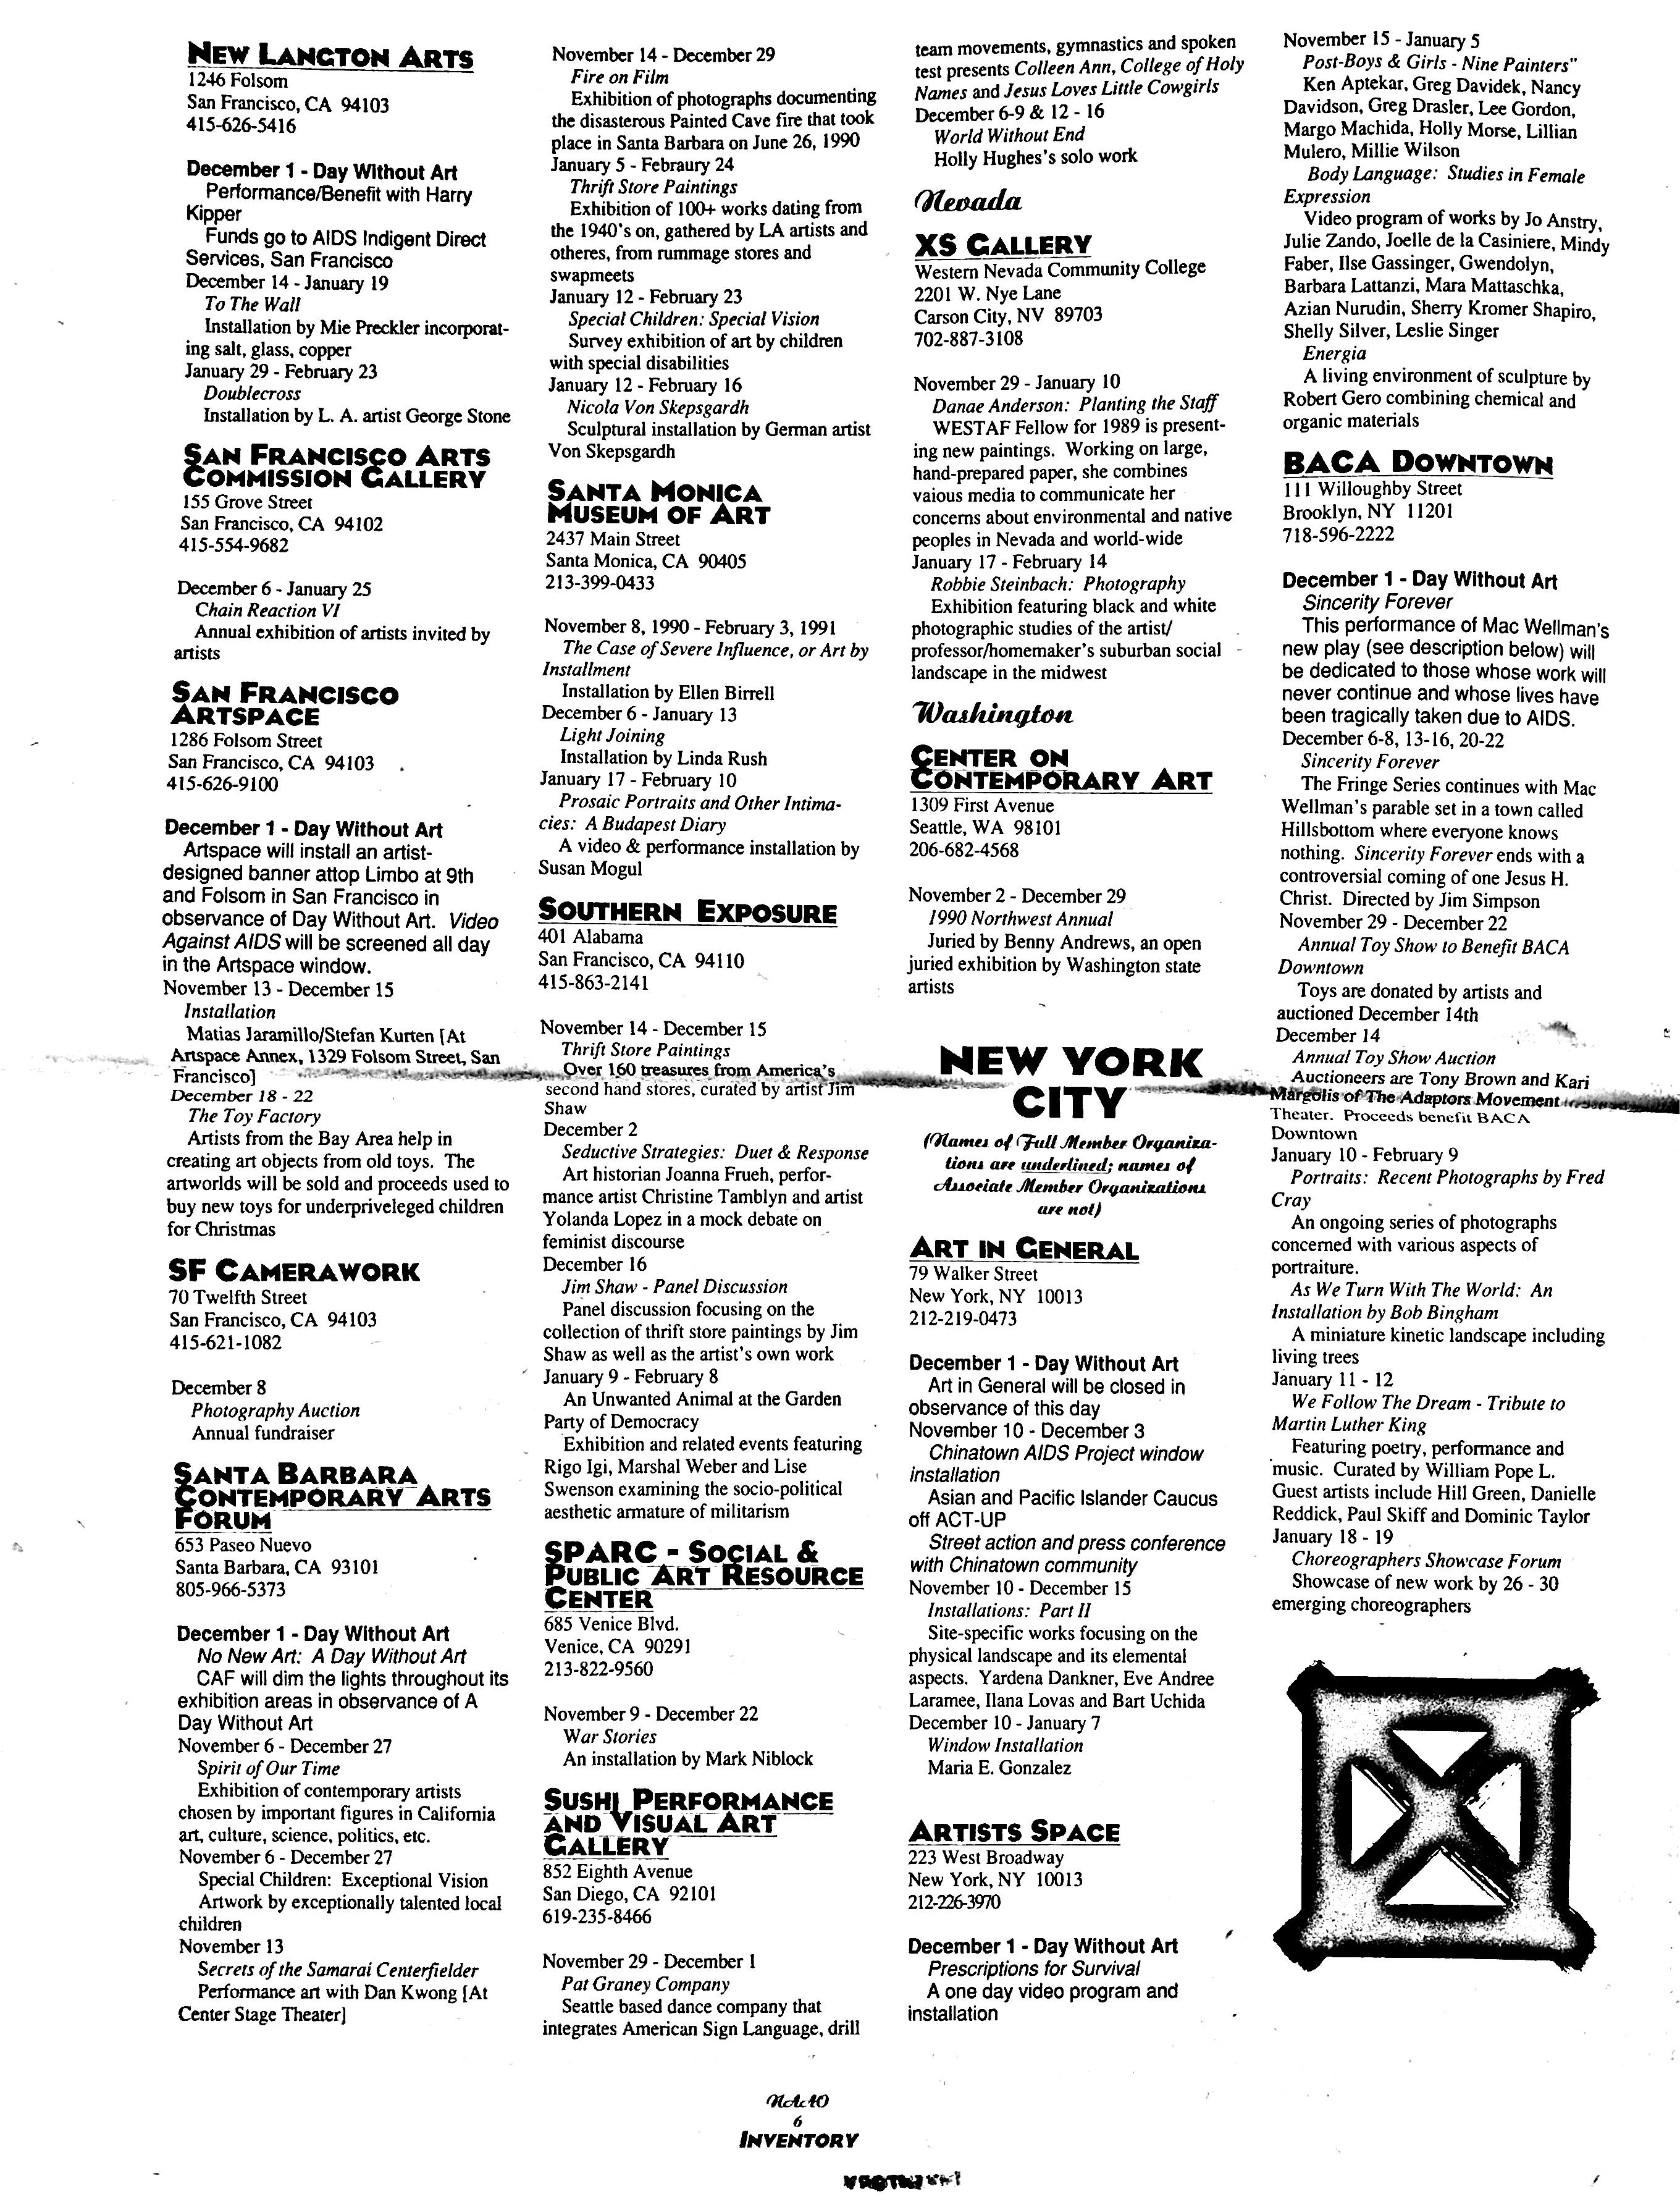 November 1990 - NAAO Bulletin Page 13.jpg